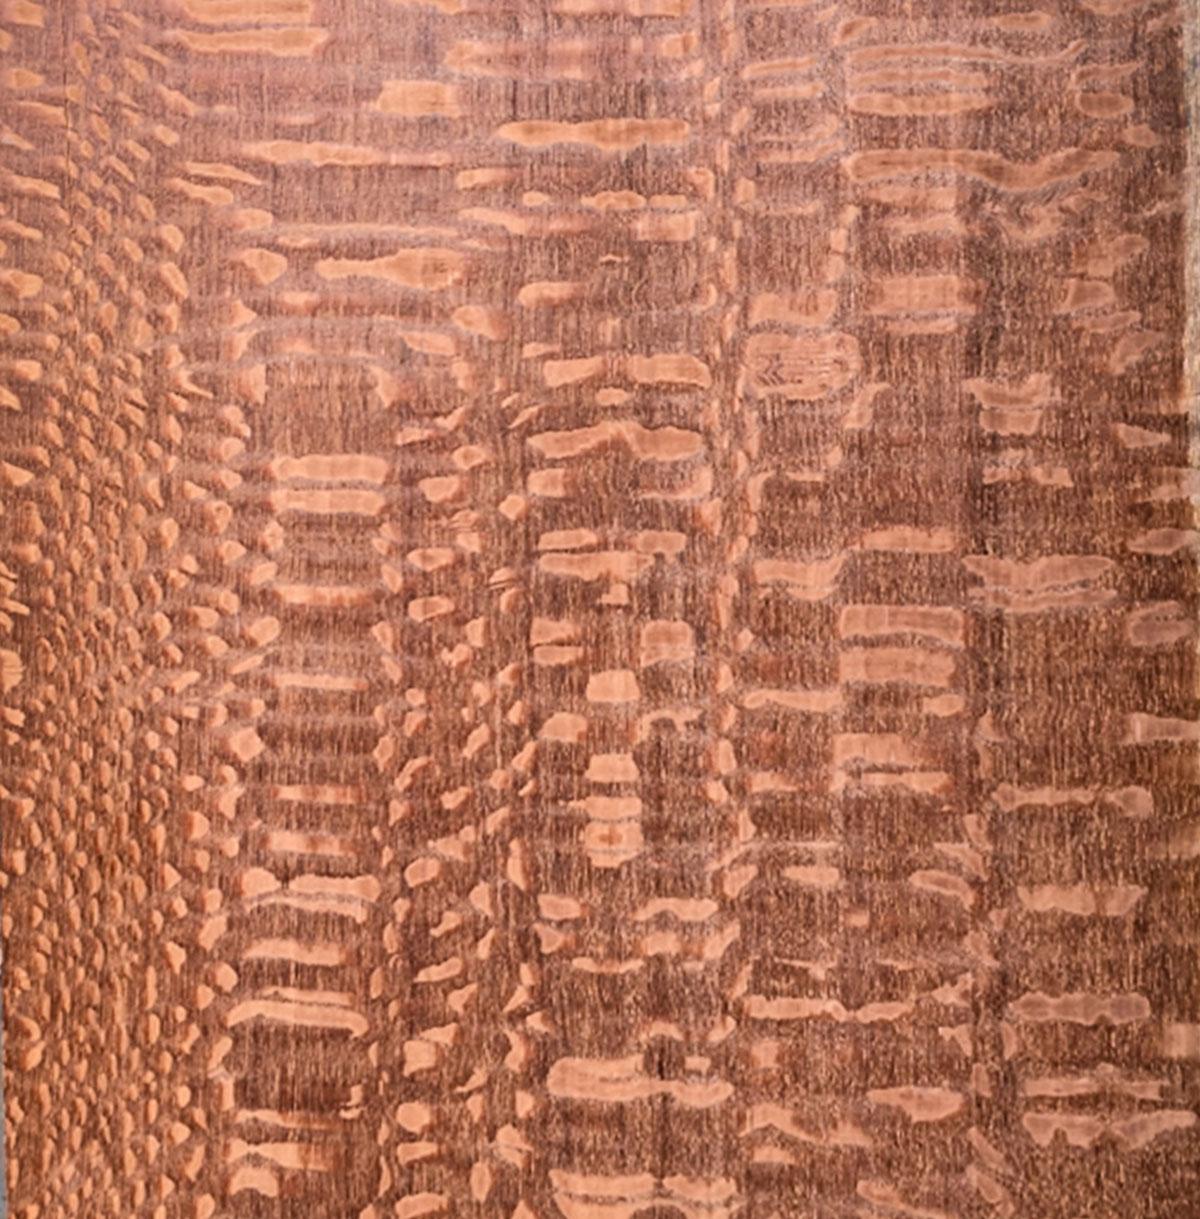 Leopardwood – Rare Earth Hardwoods